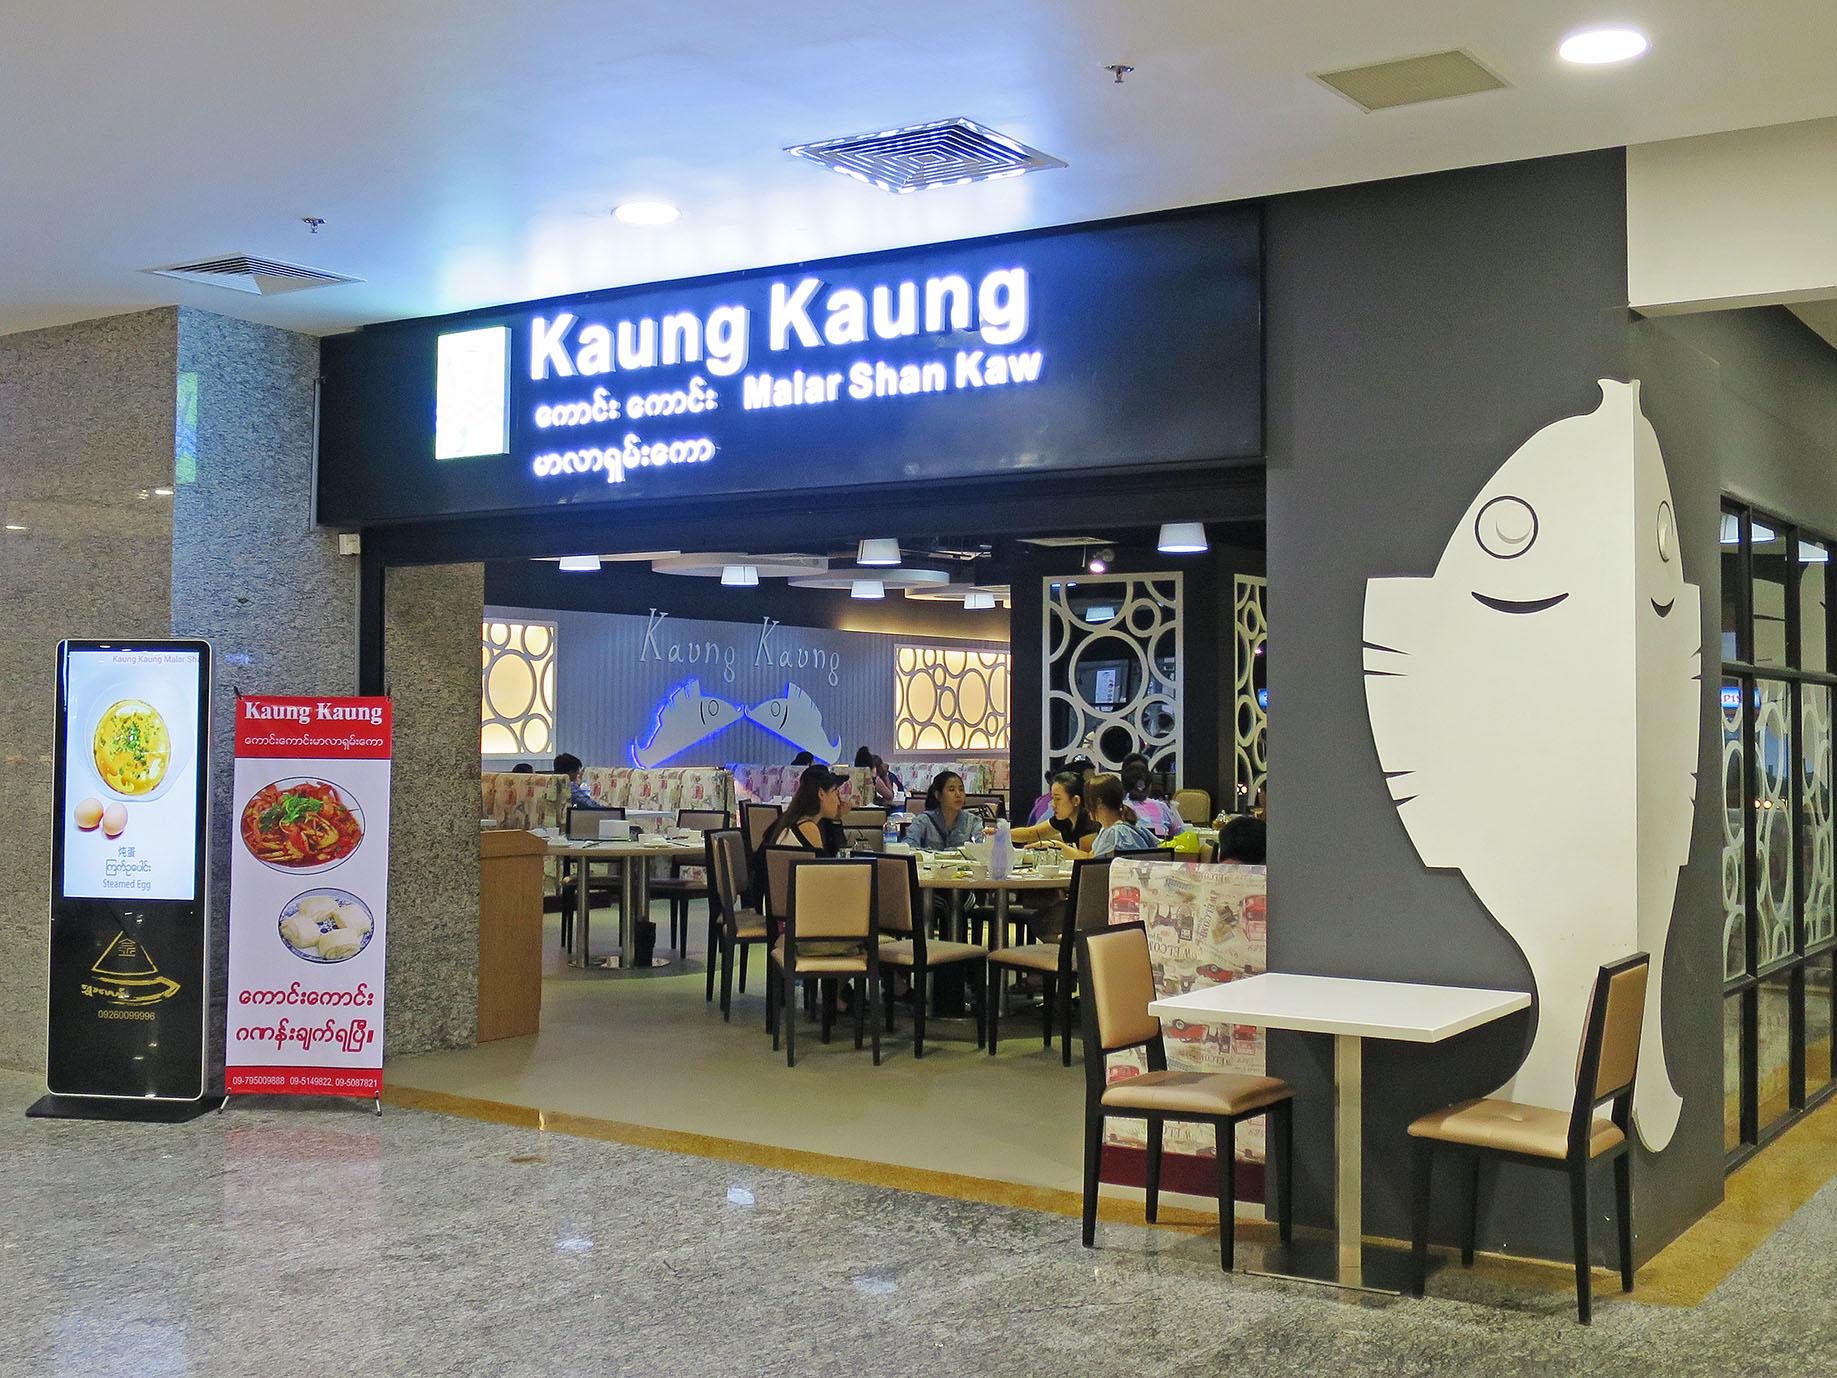 Kaung Kaung(ミャンマープラザ店) 住所:3F, Myanmar Plaza, Kabar Aye Paya Rd, Bahan Tsp., Yangon 営業時間:10:00~21:00(金・土曜~22:00)